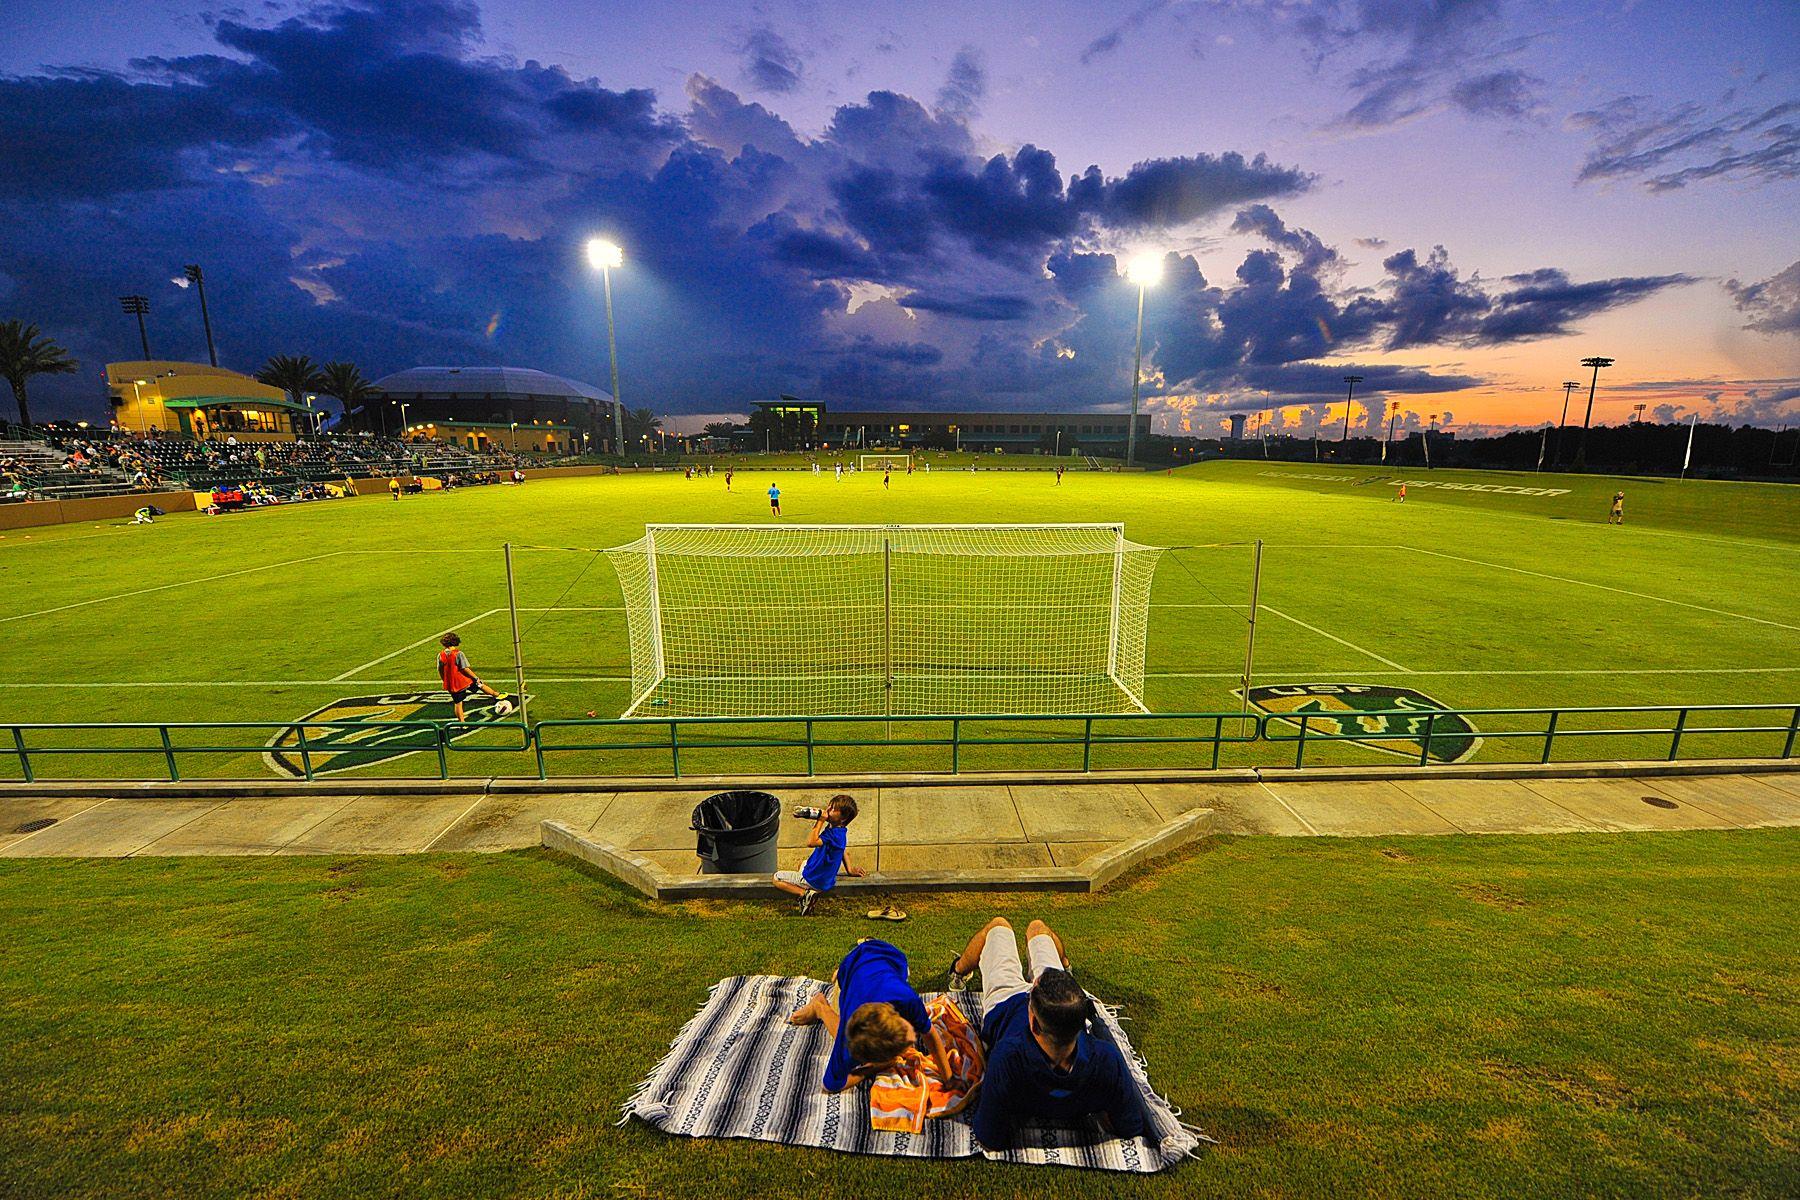 usf corbett soccer stadium usf facilities soccer  usf corbett soccer stadium